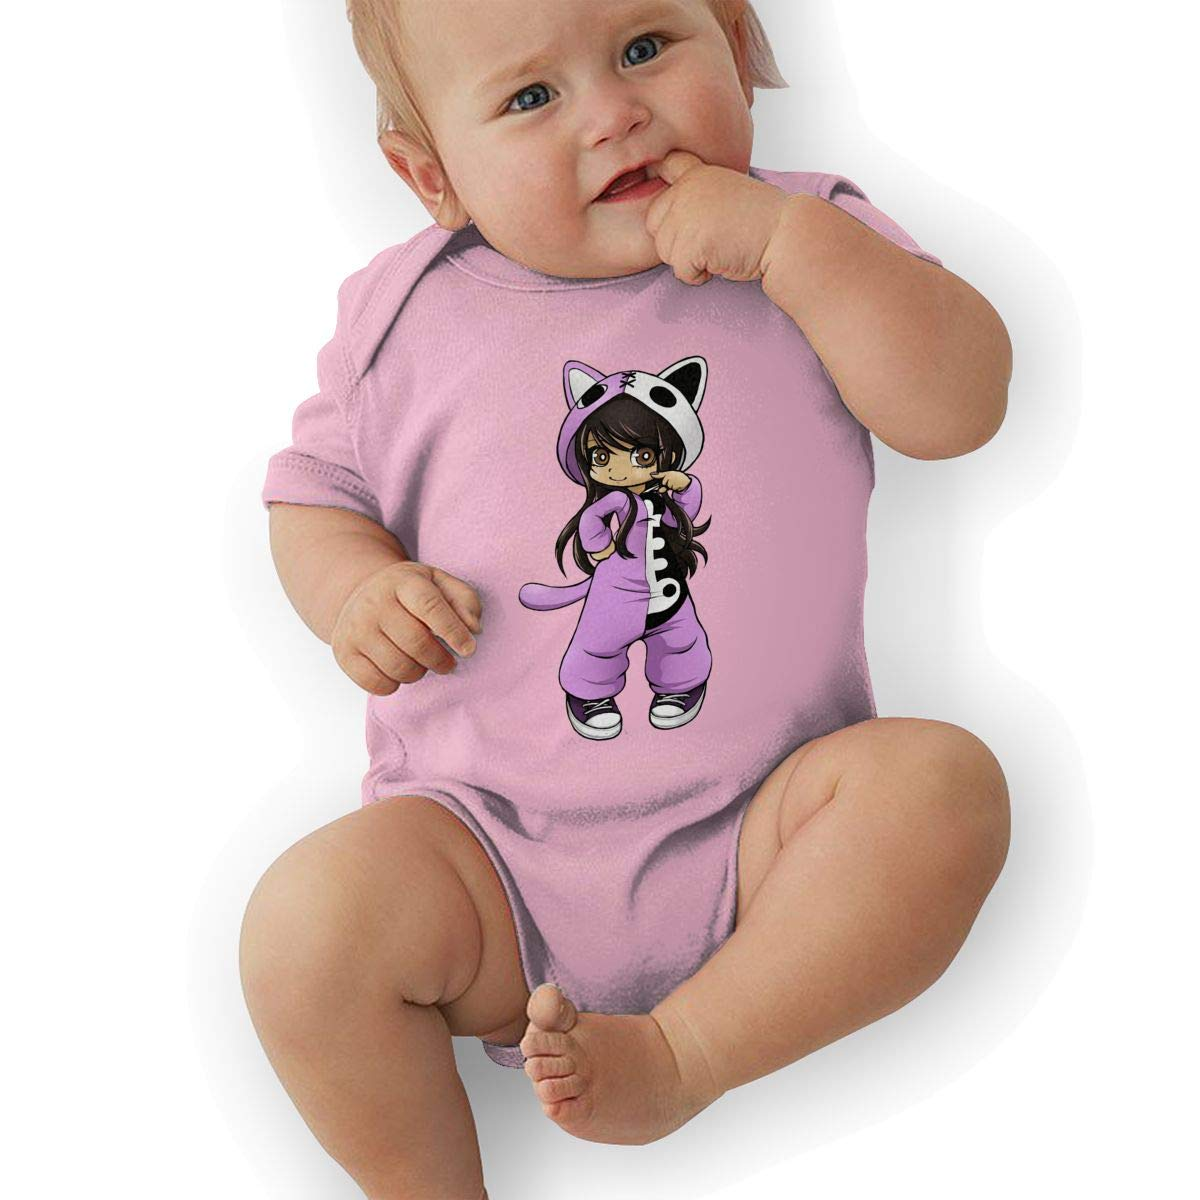 Toddler Baby Boys Bodysuit Short-Sleeve Onesie Girl Wear Pajamas Like A Cat Print Jumpsuit Spring Pajamas